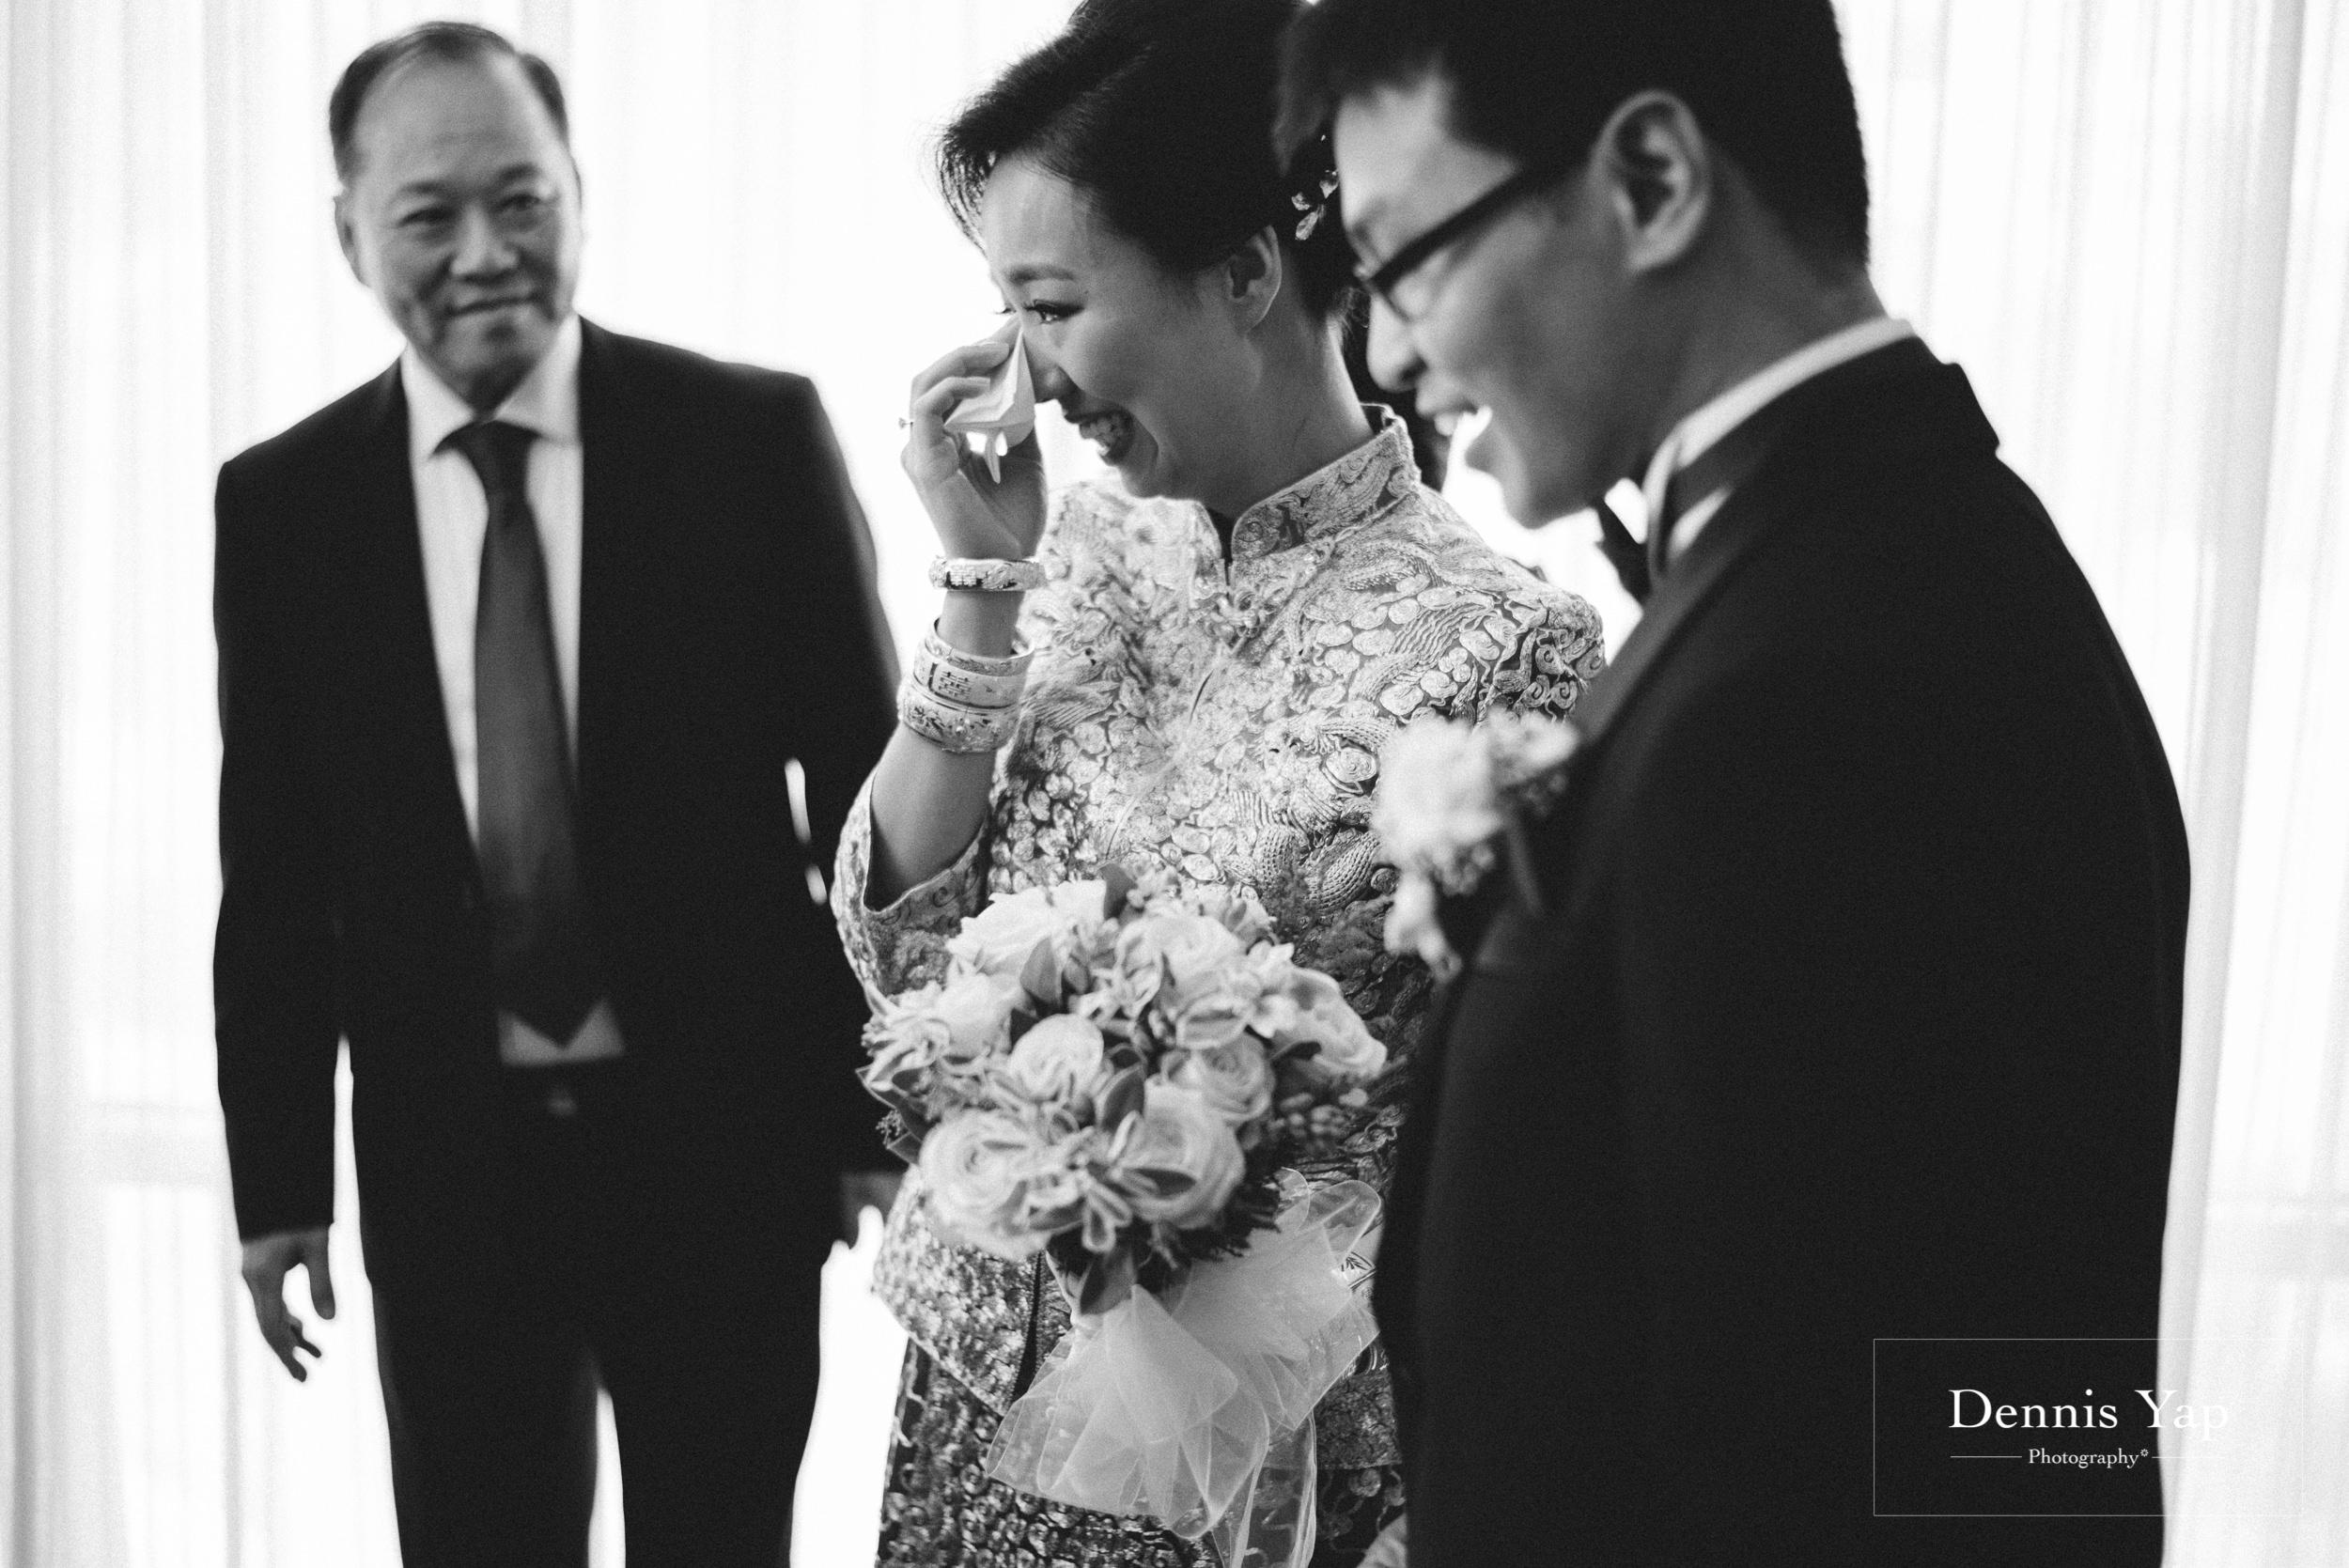 wai keong jenny wedding day bangsar dennis yap photography emotions beloved family-18.jpg